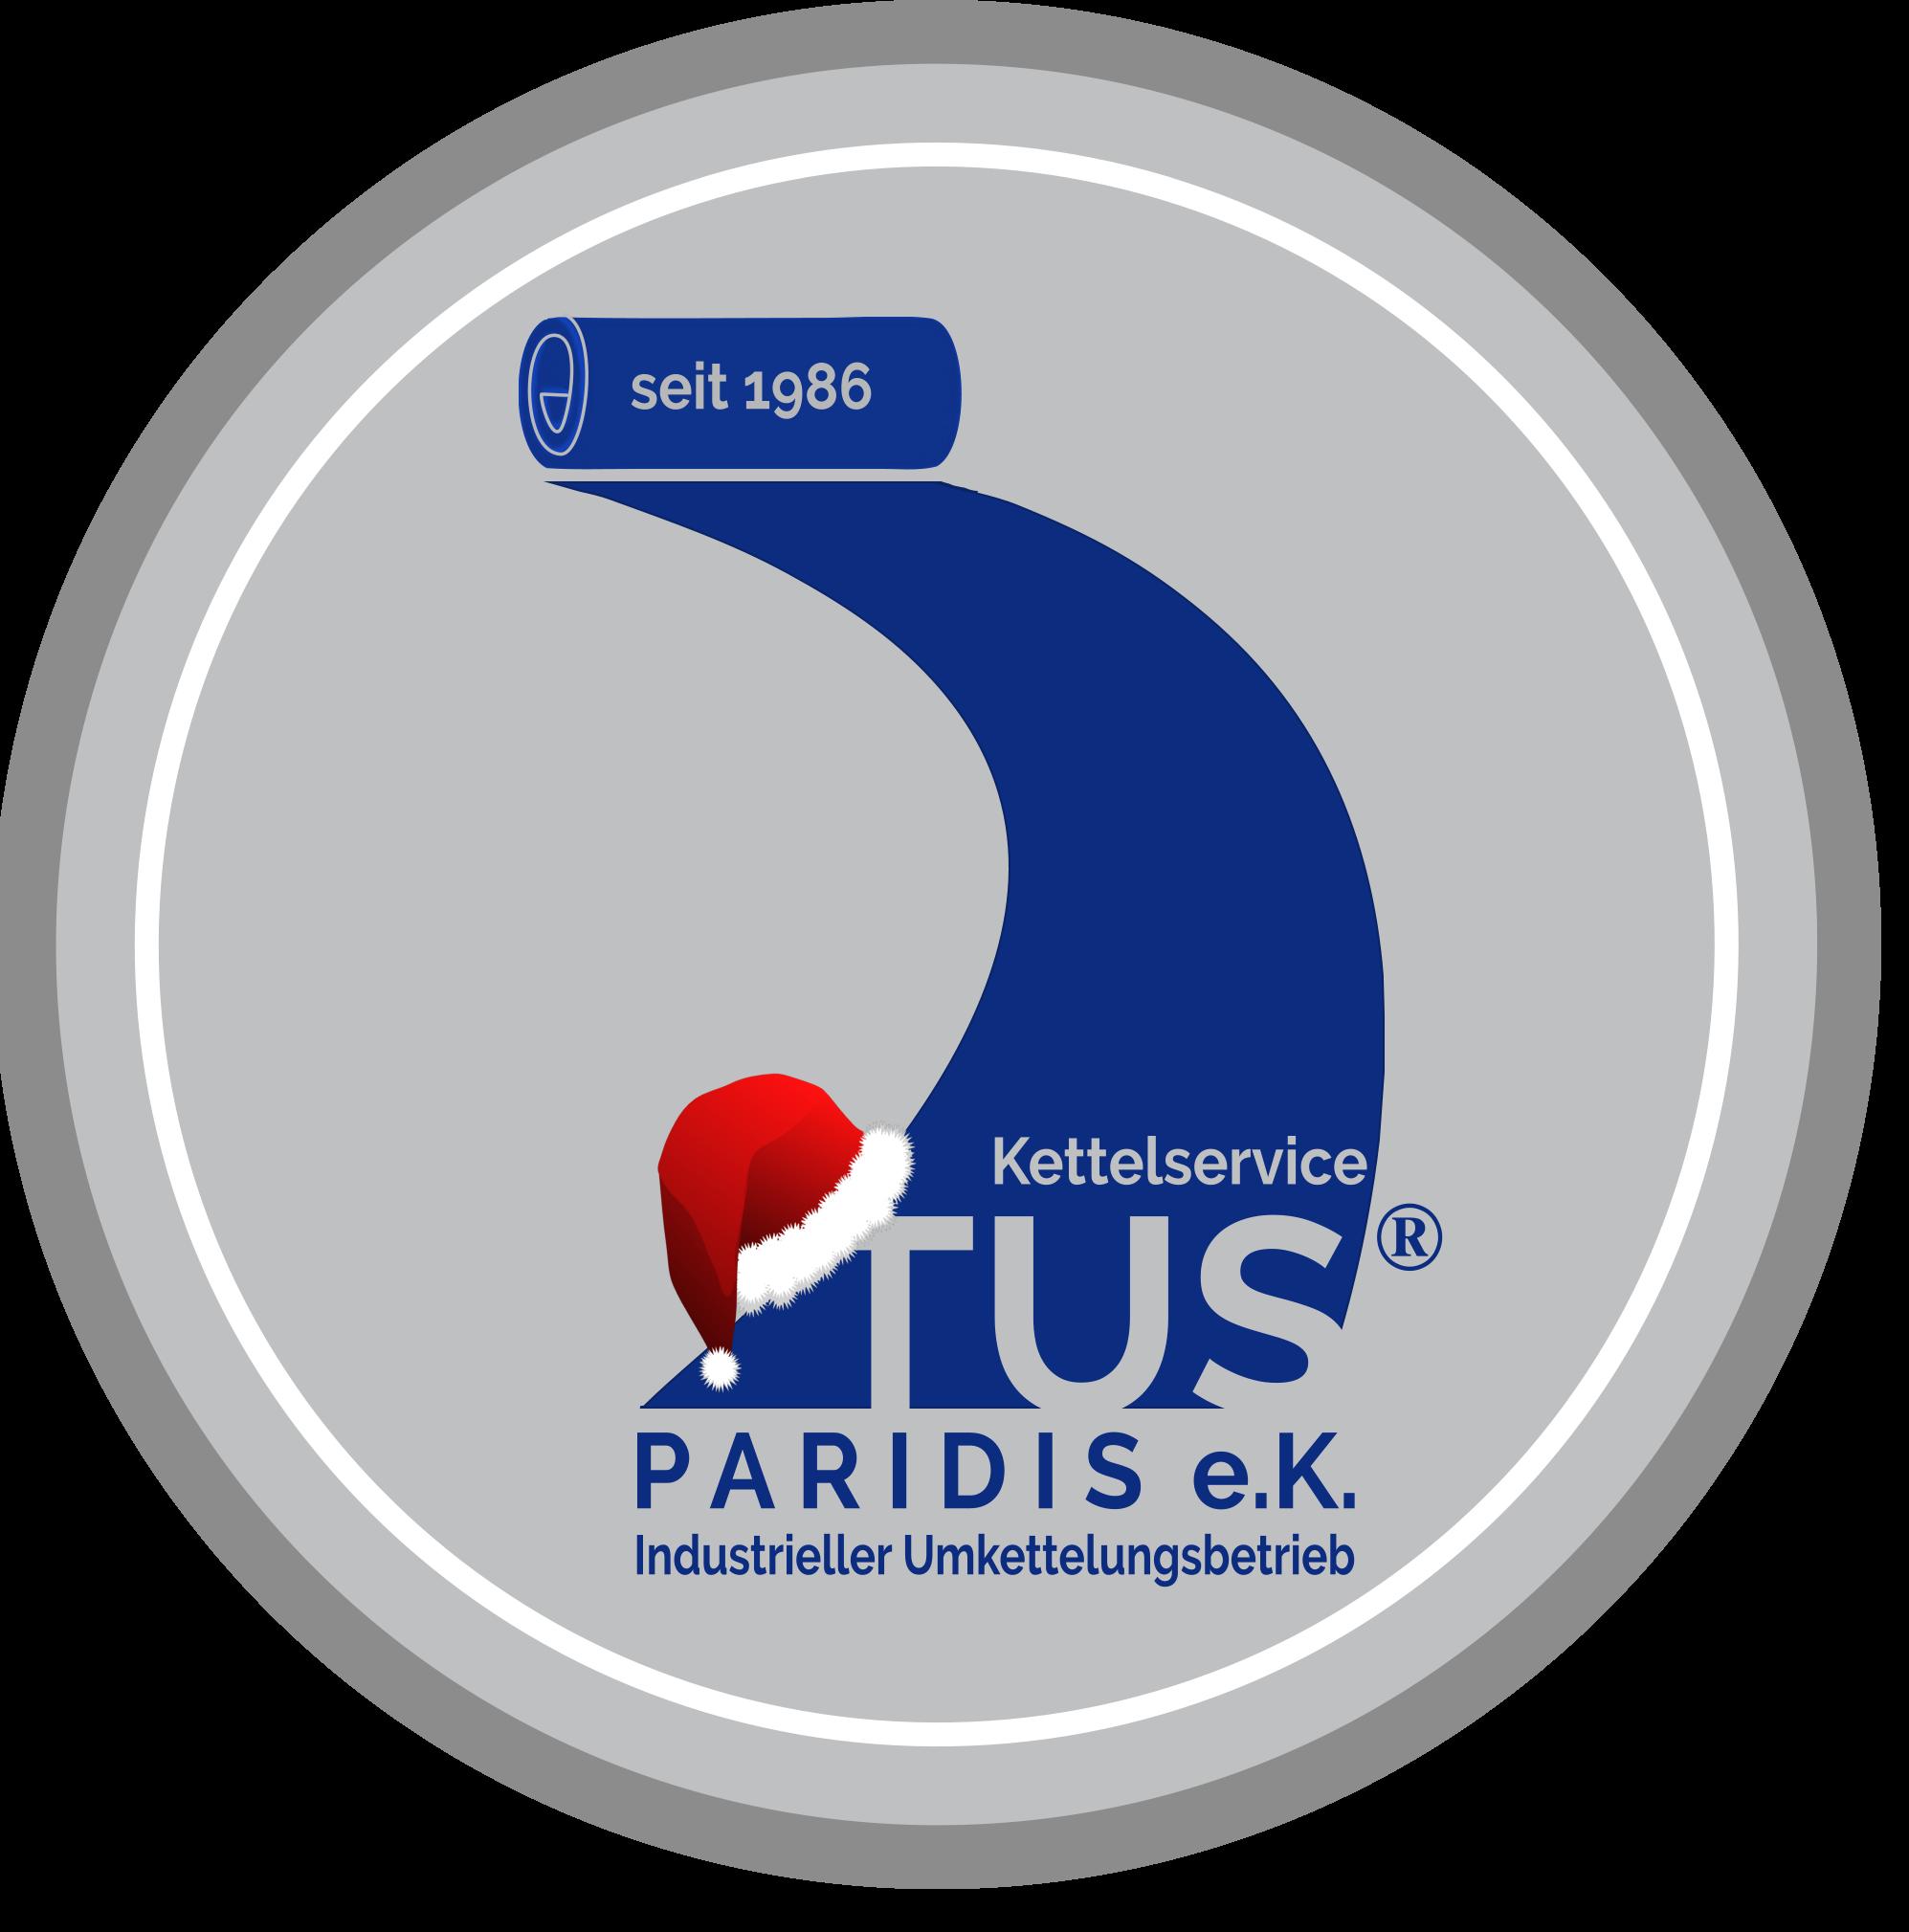 Kettelservice TUS® Paridis seit 1986